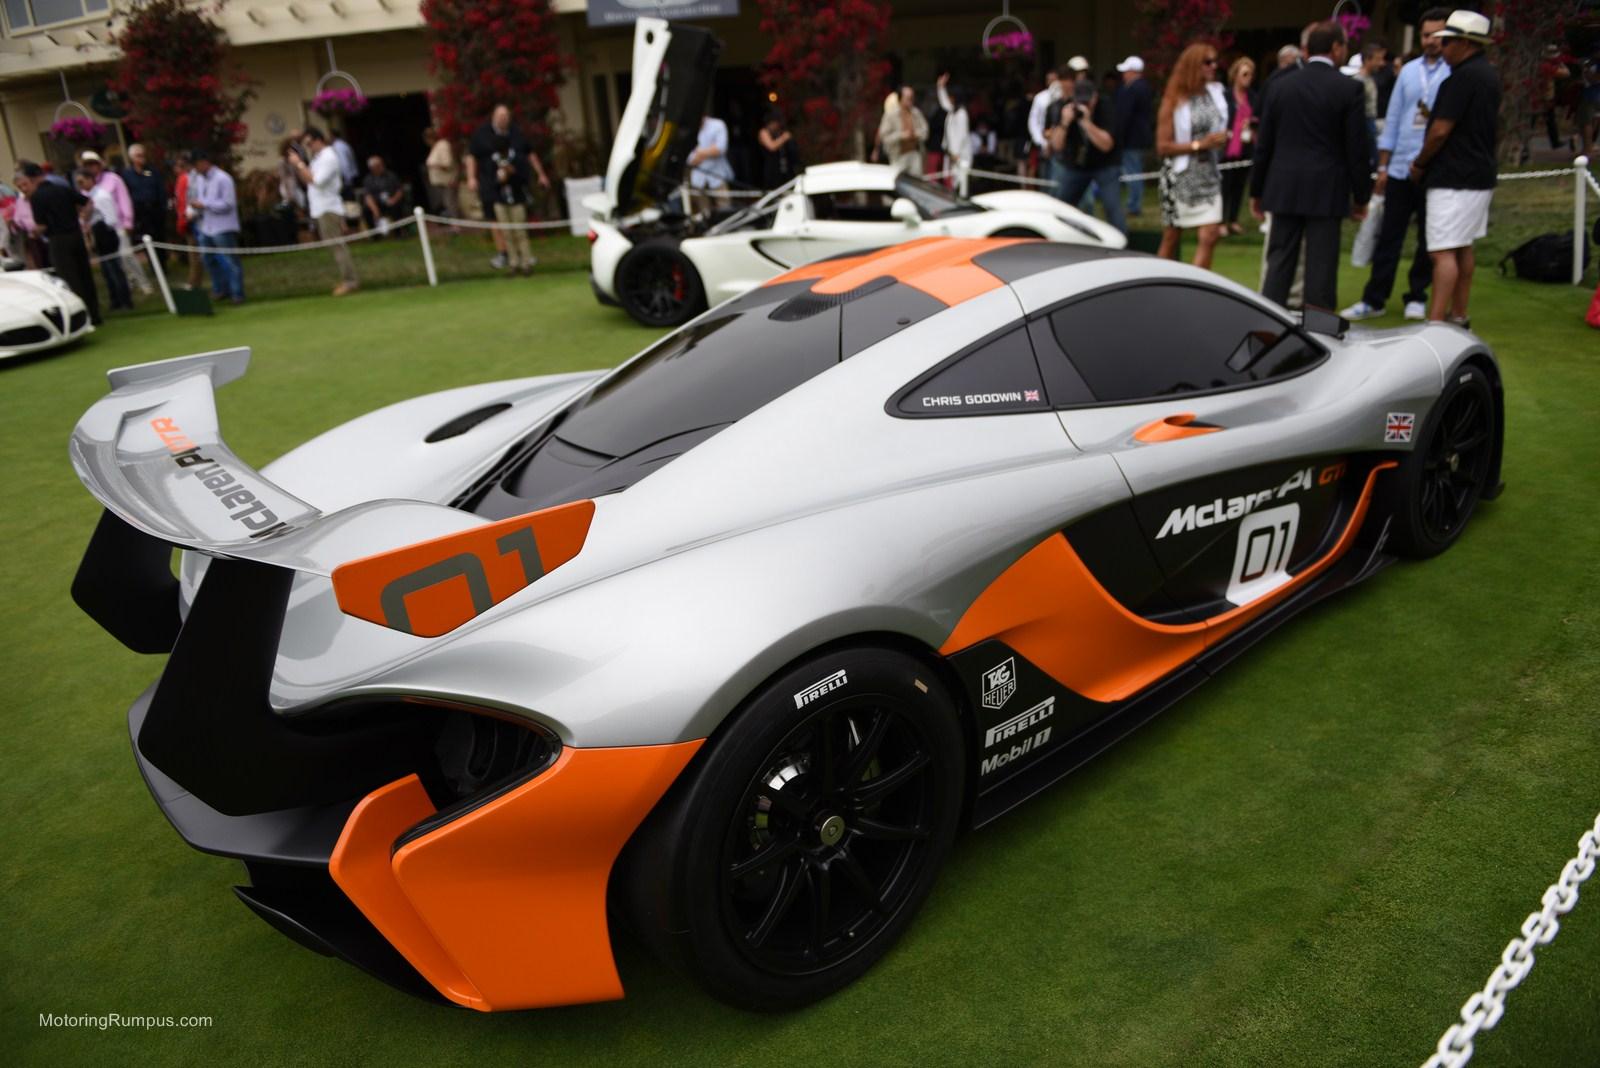 http://motoringrumpus.com/wp-content/uploads/2014/11/2014-Pebble-Beach-Concours-dElegance-2016-McLaren-P1-GTR-Design-Concept.jpg